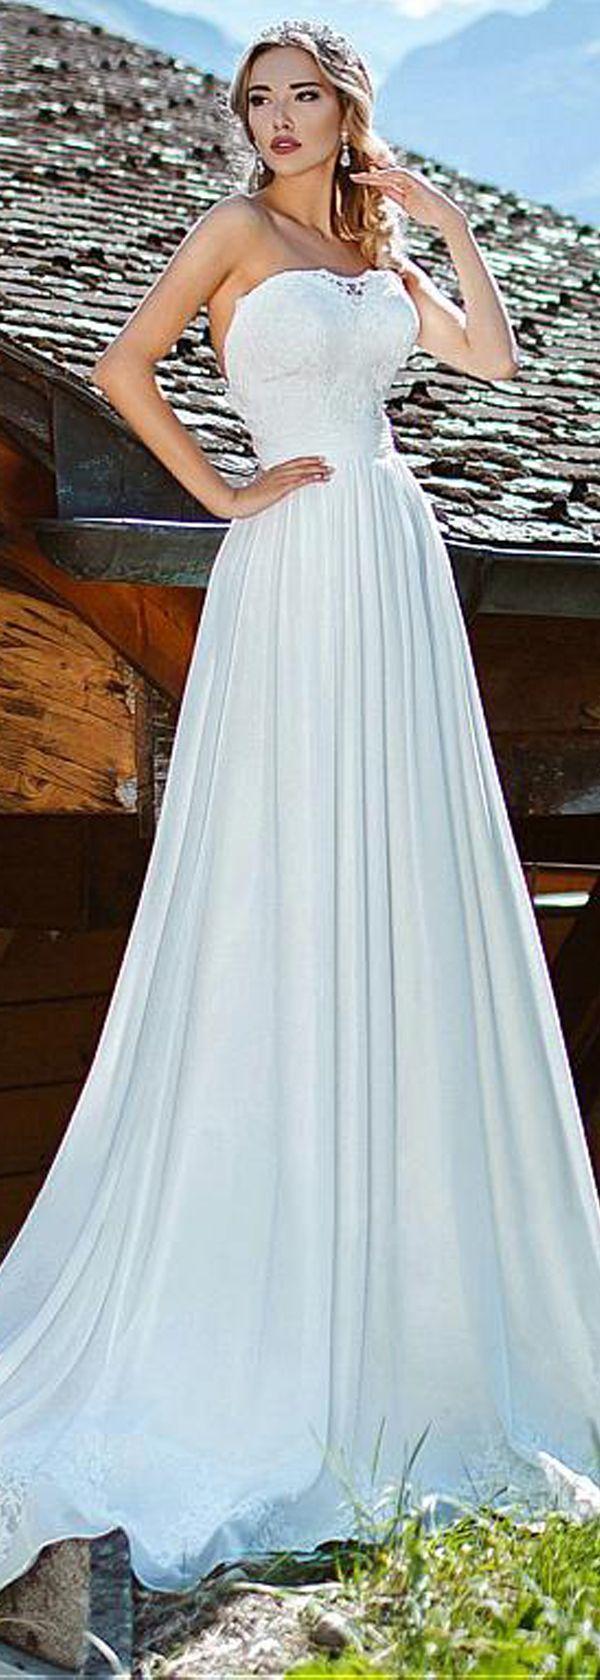 Fancy Vestidos De Novia En Pamplona Mold - Wedding Dress Ideas ...